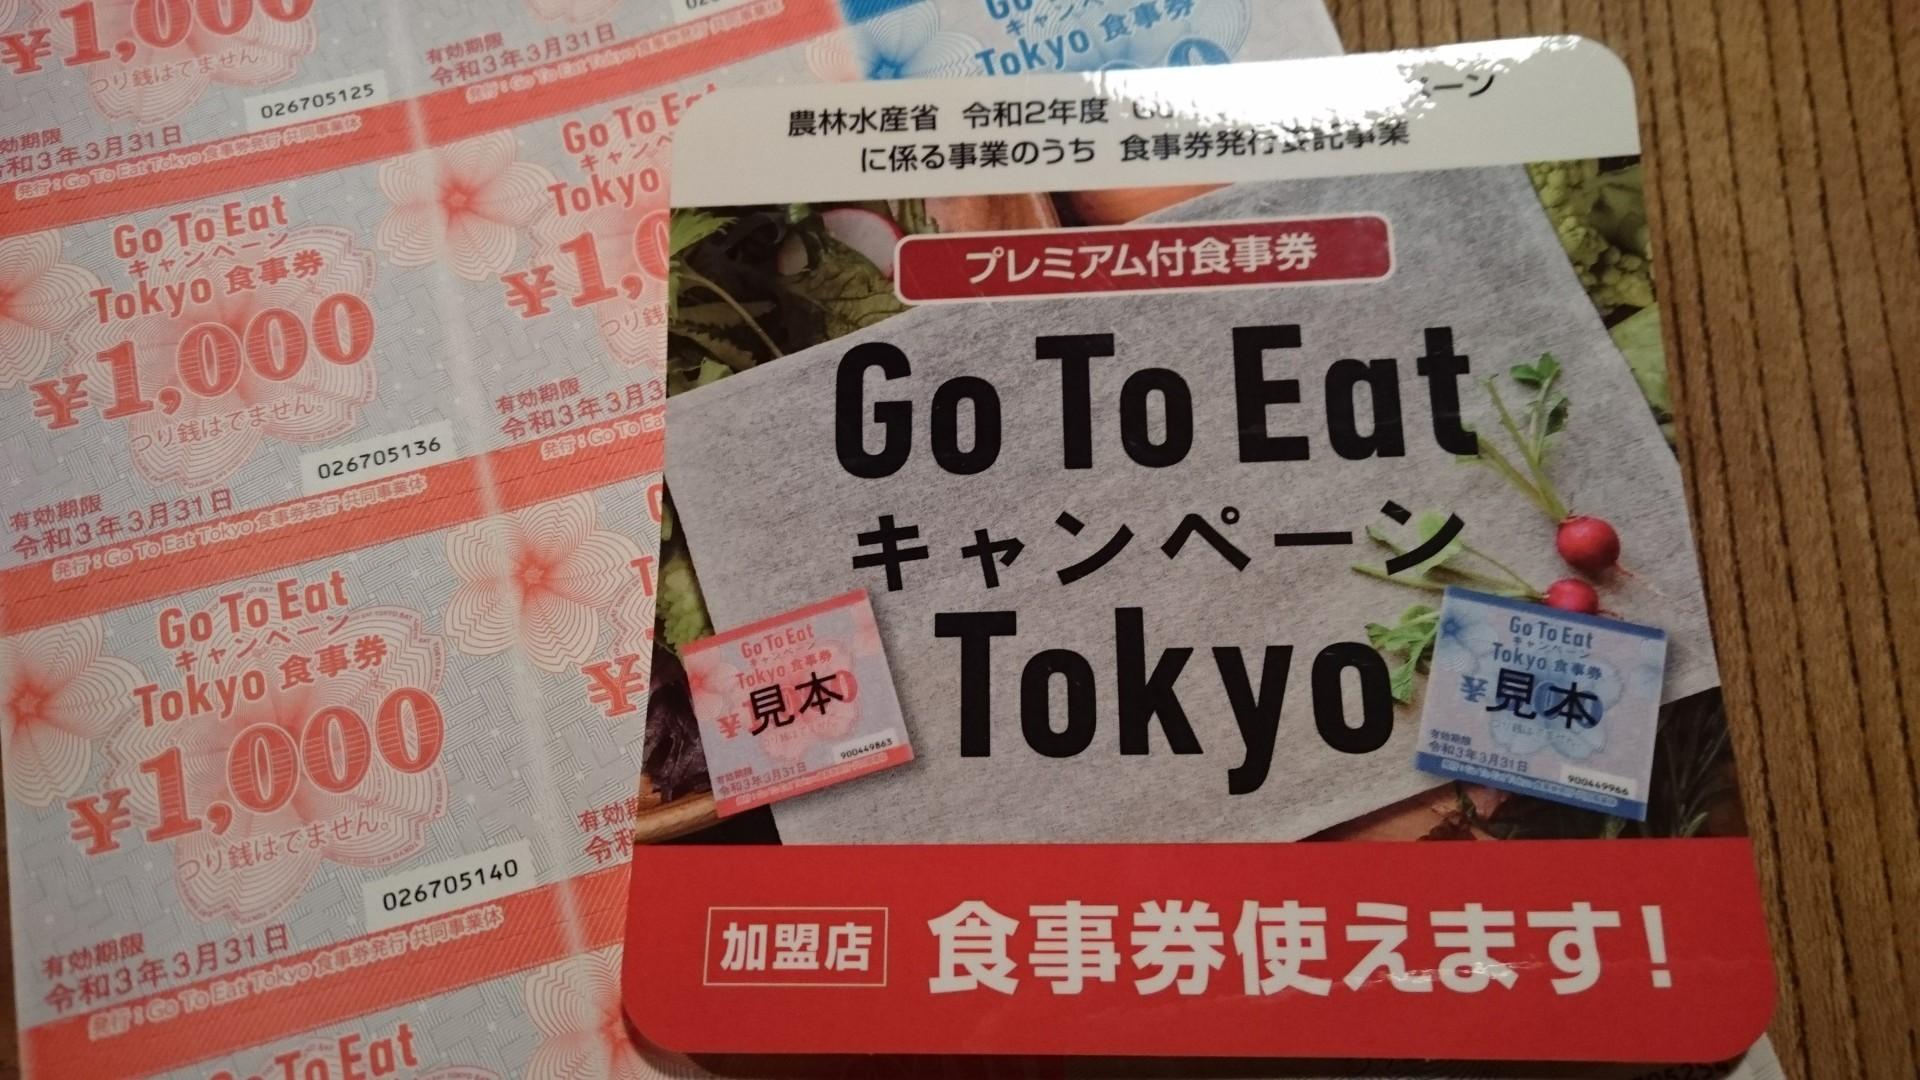 Go To Eat プレミアム付食事券_b0162386_16034338.jpg